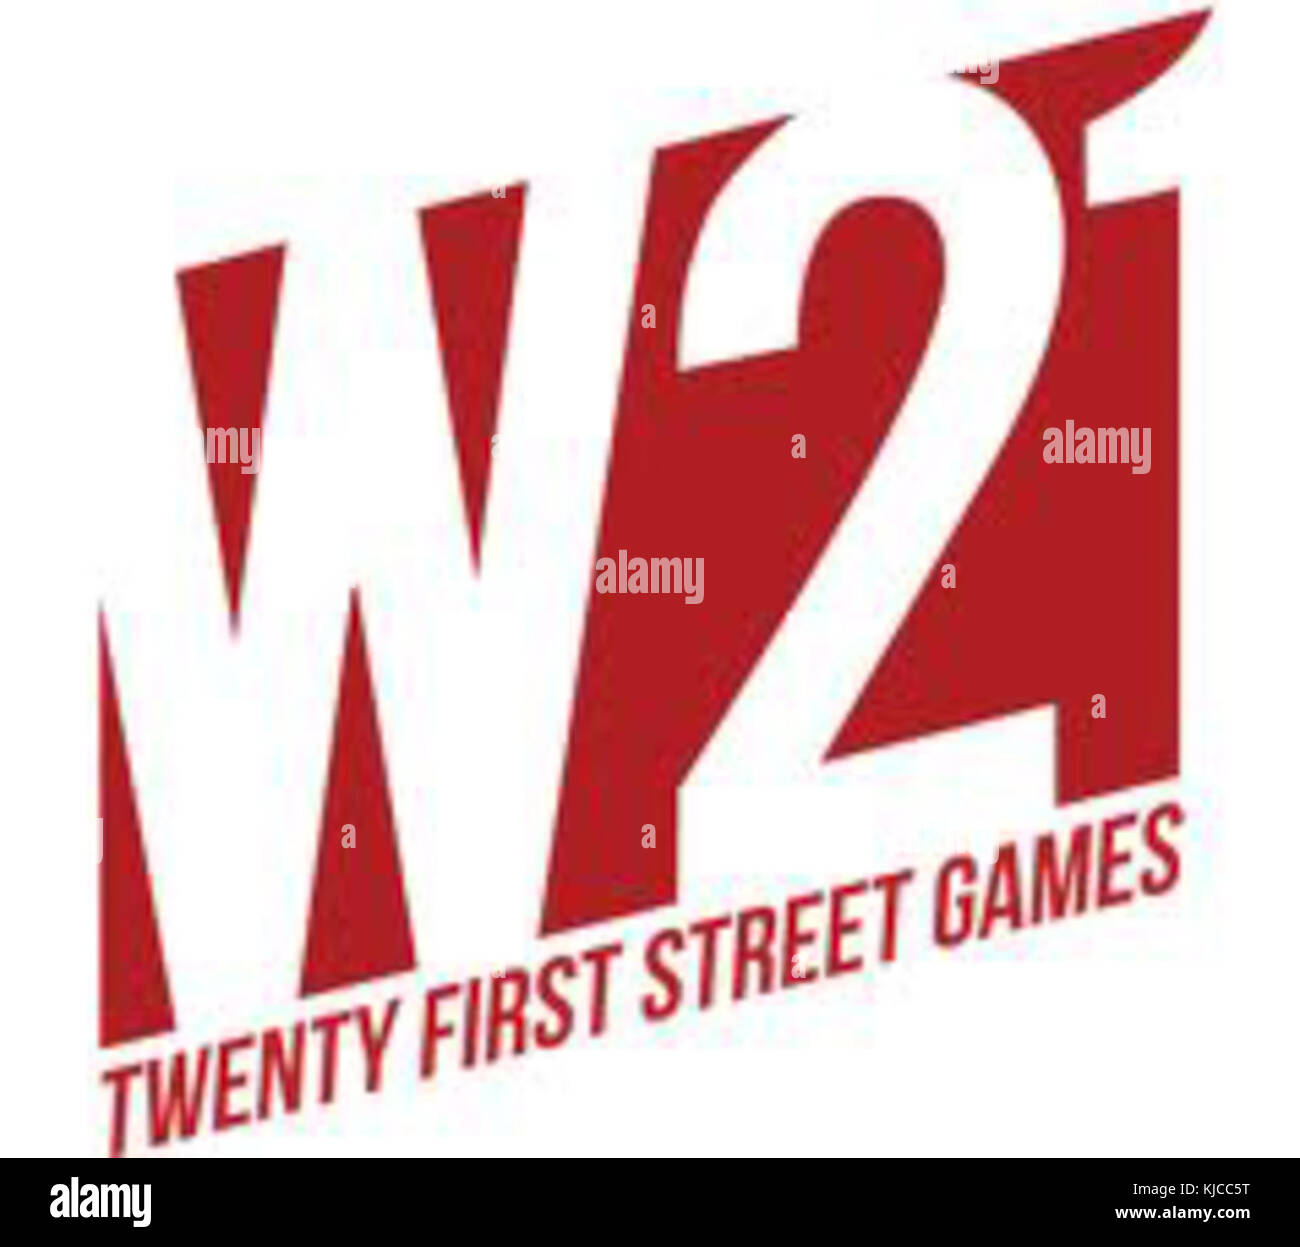 21st Street Games Logo - Stock Image